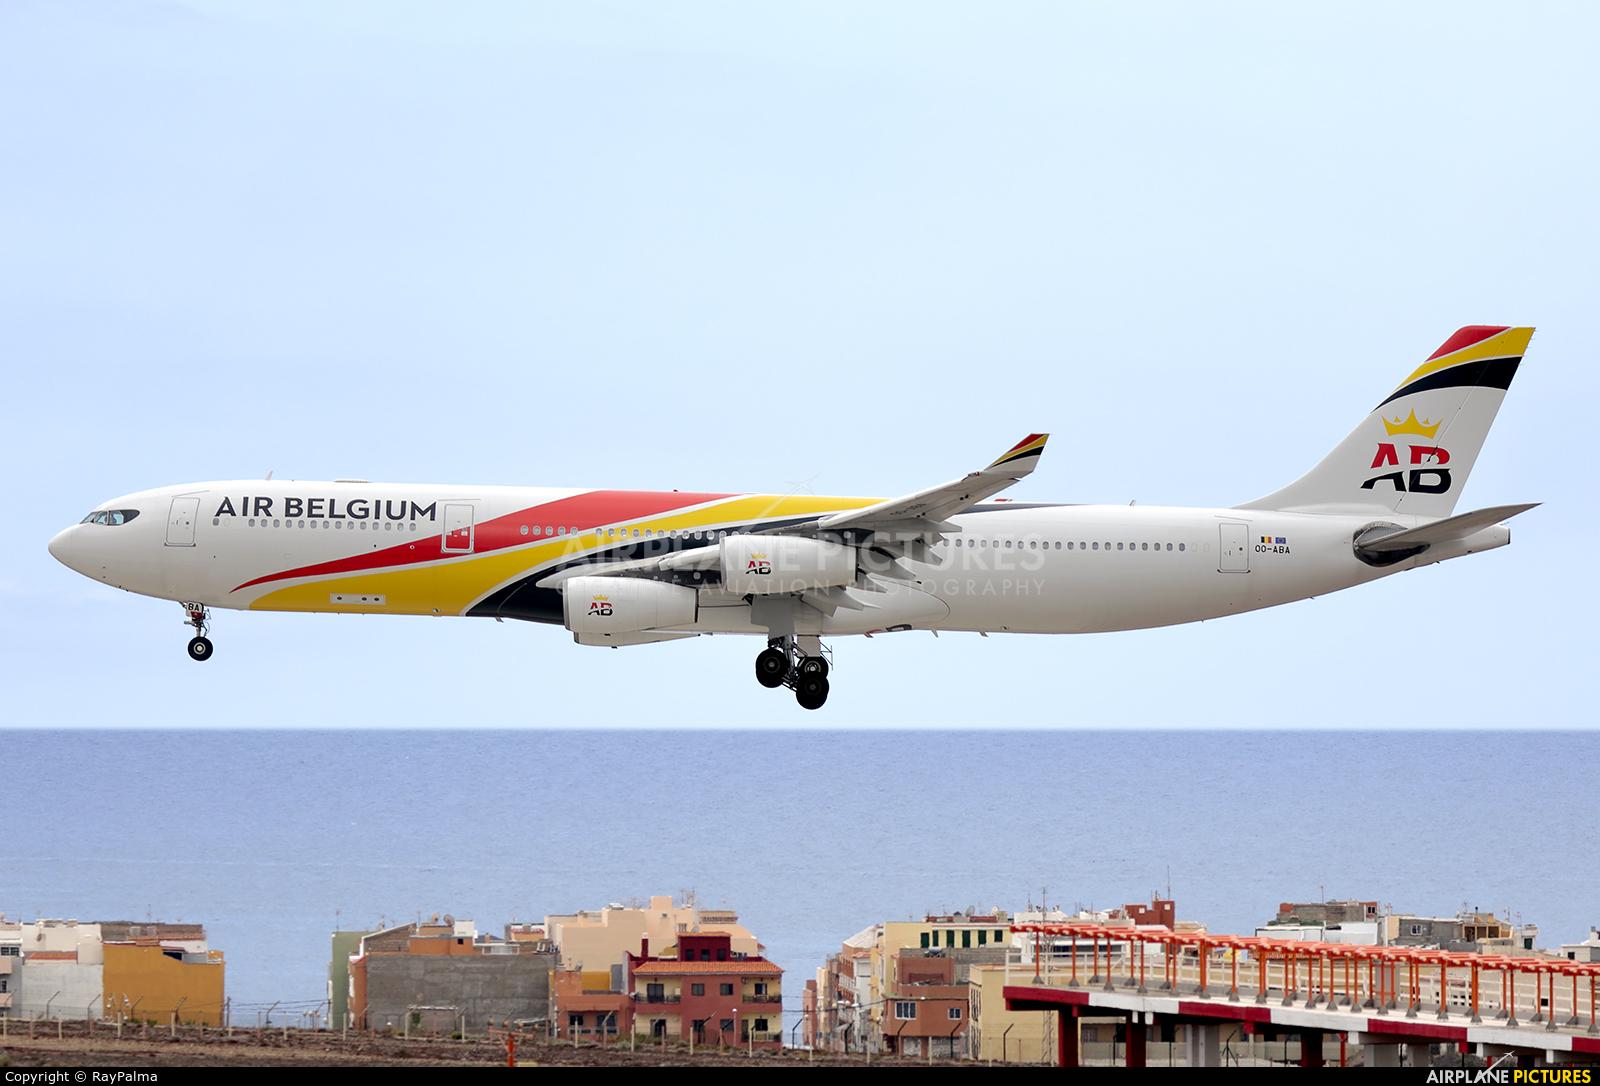 Air Belgium OO-ABA aircraft at Tenerife Sur - Reina Sofia